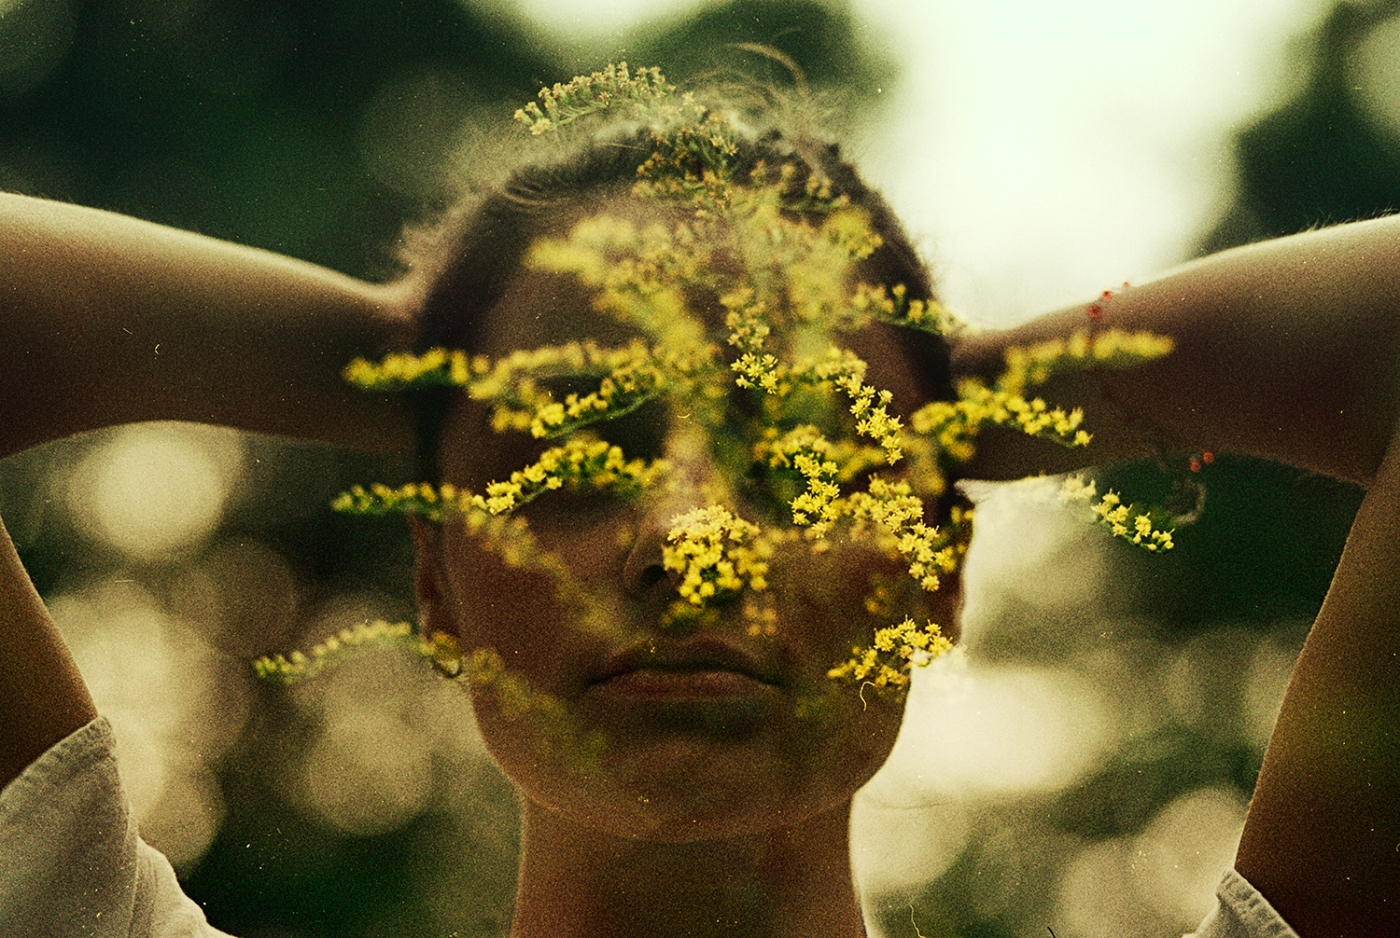 A photograph by Sergey Berezyuk as published in Photo/Foto Magazine